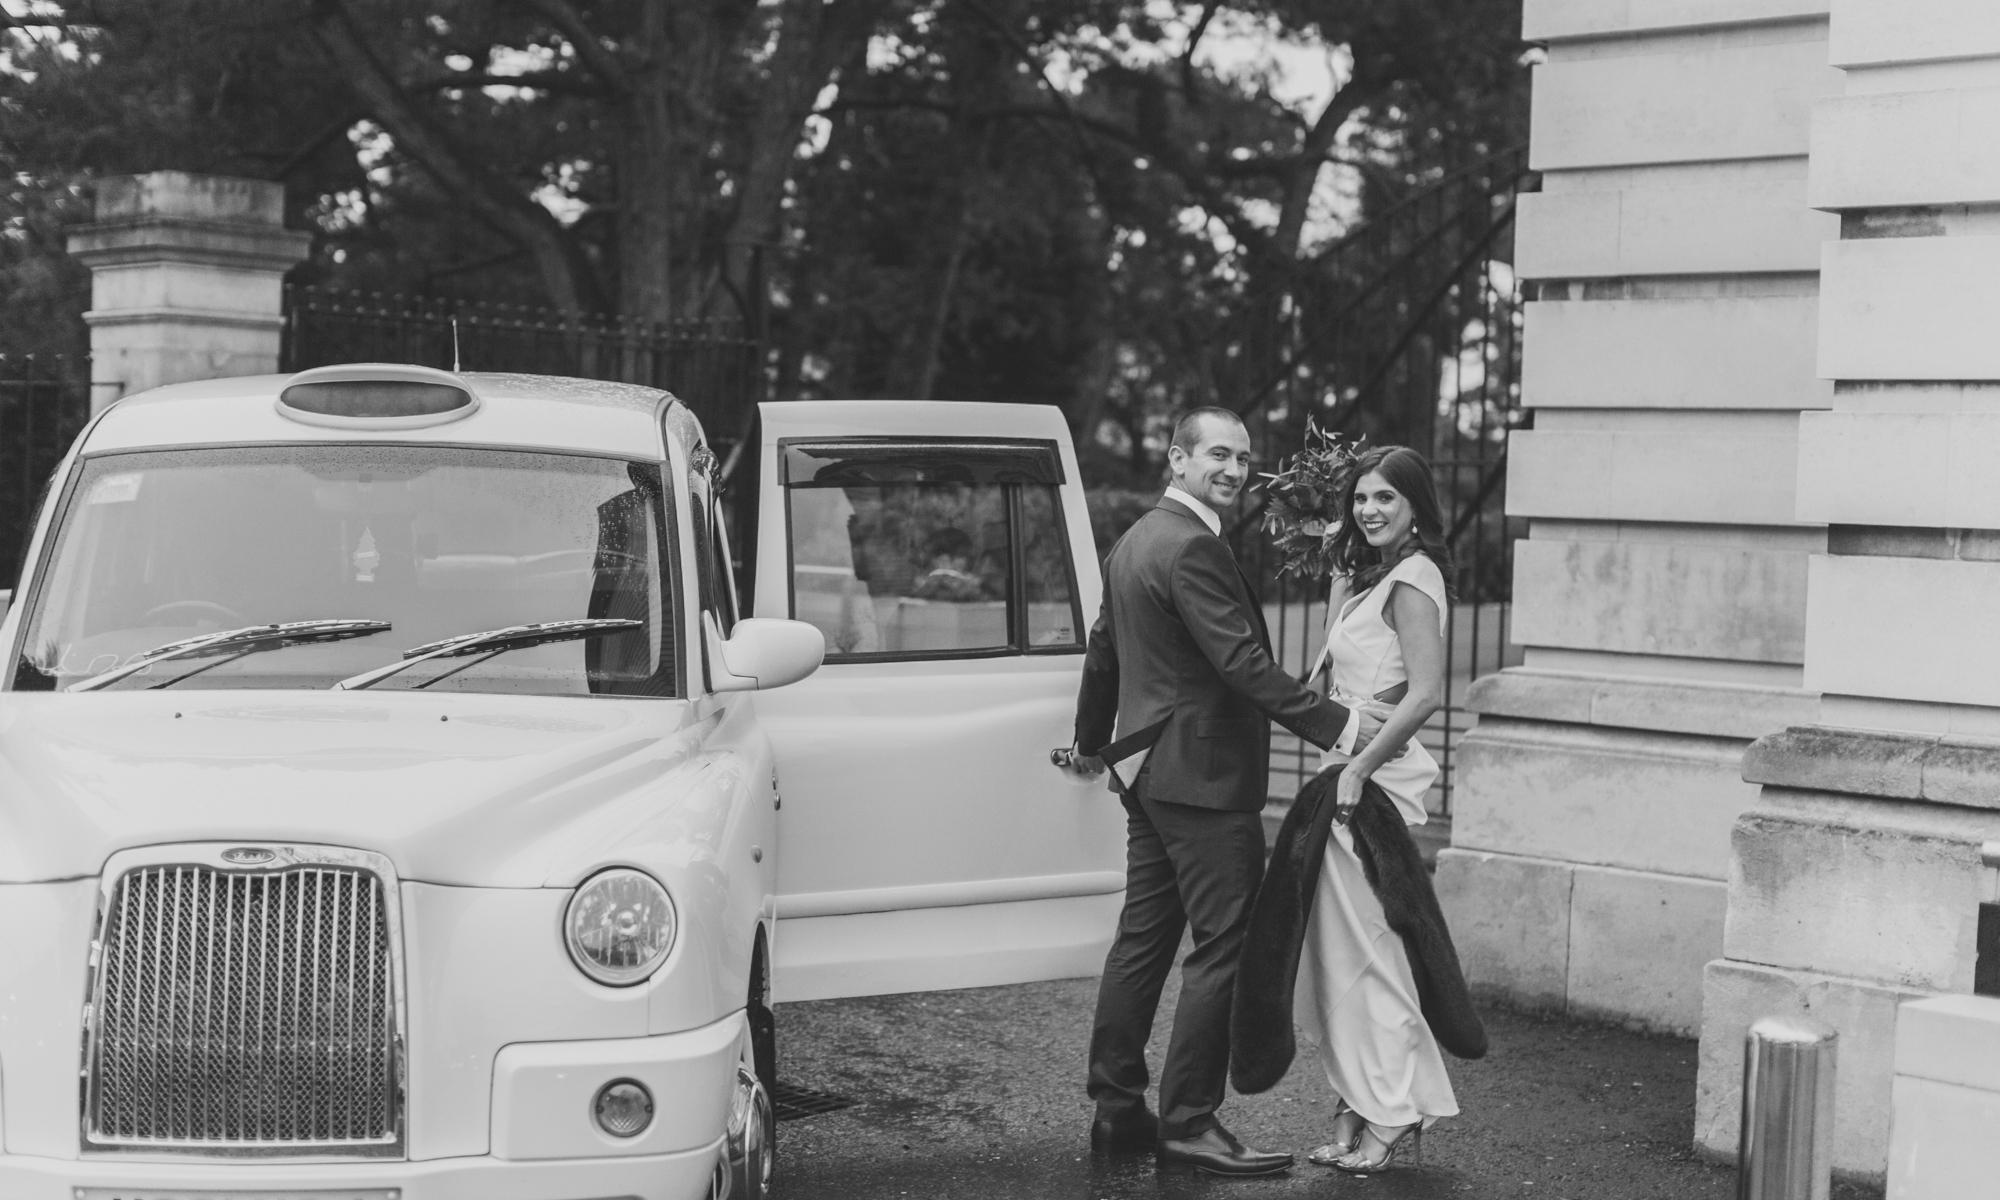 City_Centre_northern_ireland_wedding_inspire_weddings_20.jpg